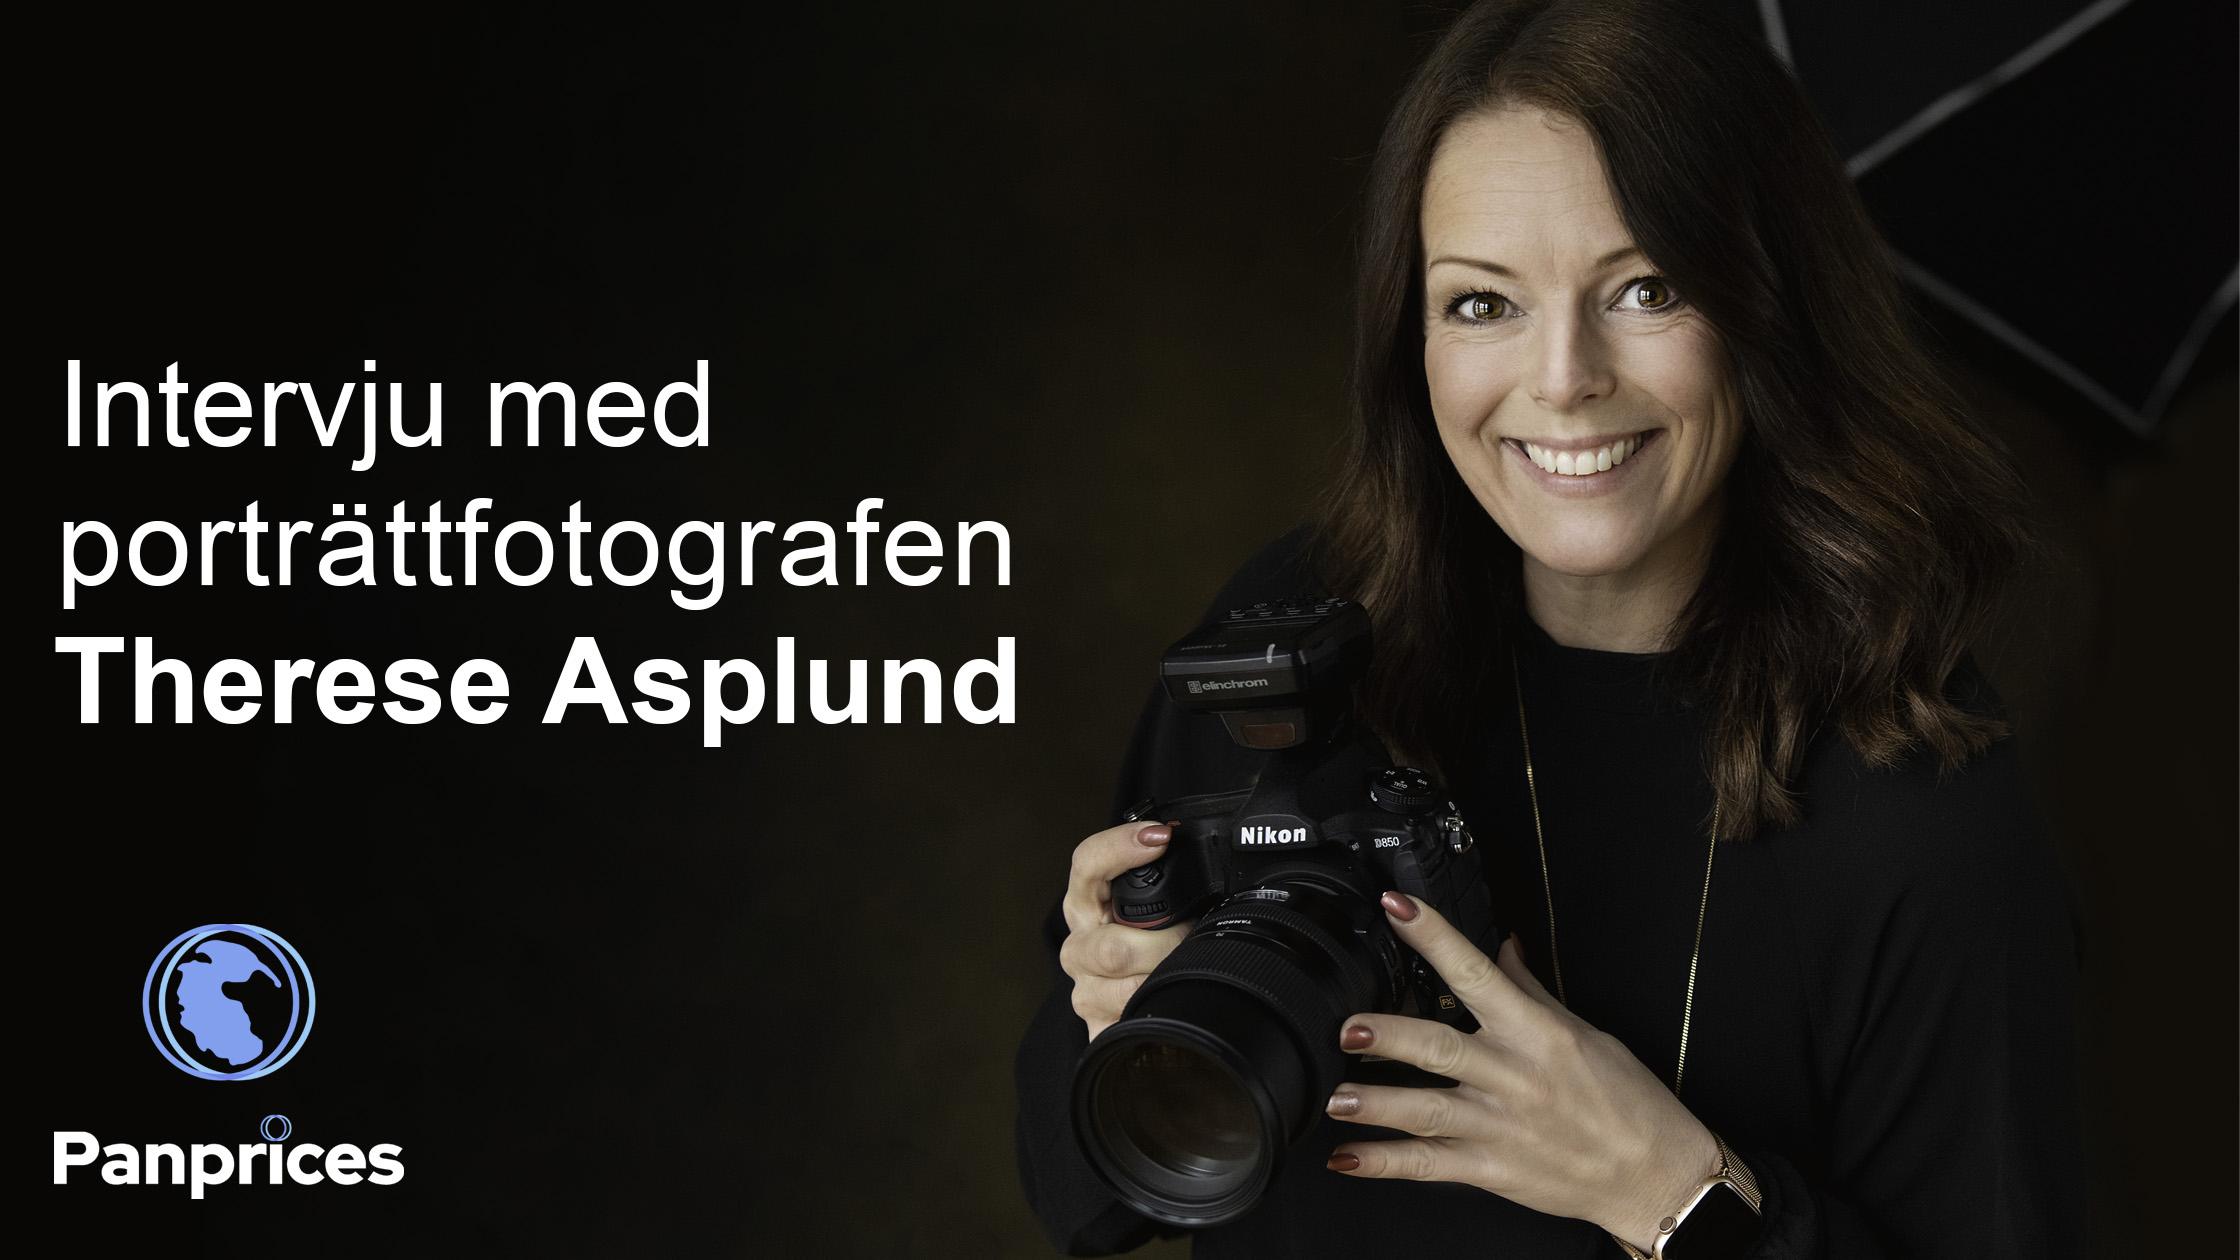 Intervju med porträttfotografen Therese Asplund